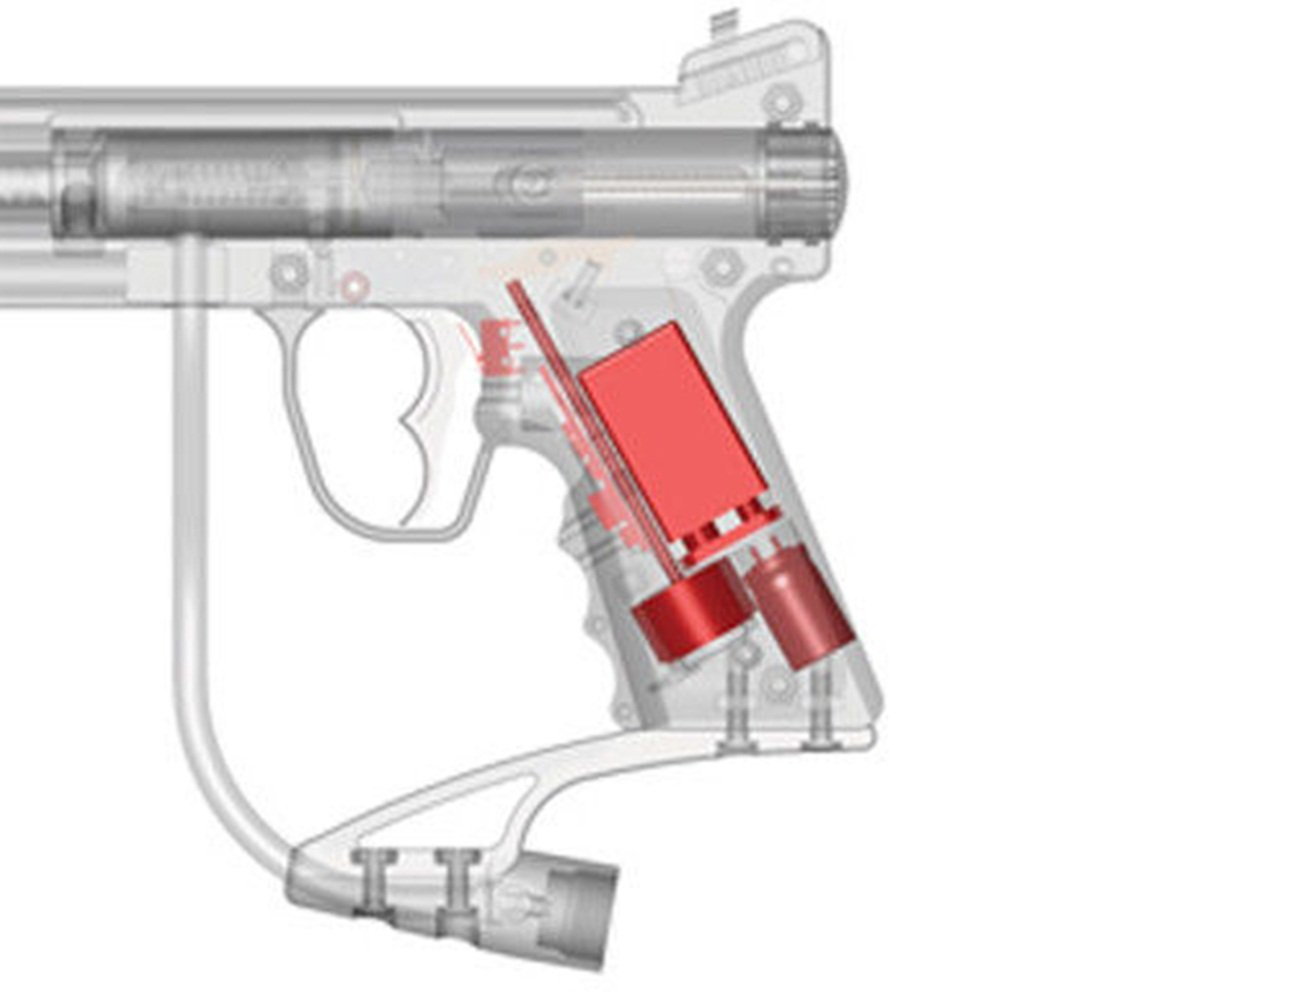 PAINTBALL TIPPMANN 98 Custom E-Grip Electronic Upgrade Kit by Loader